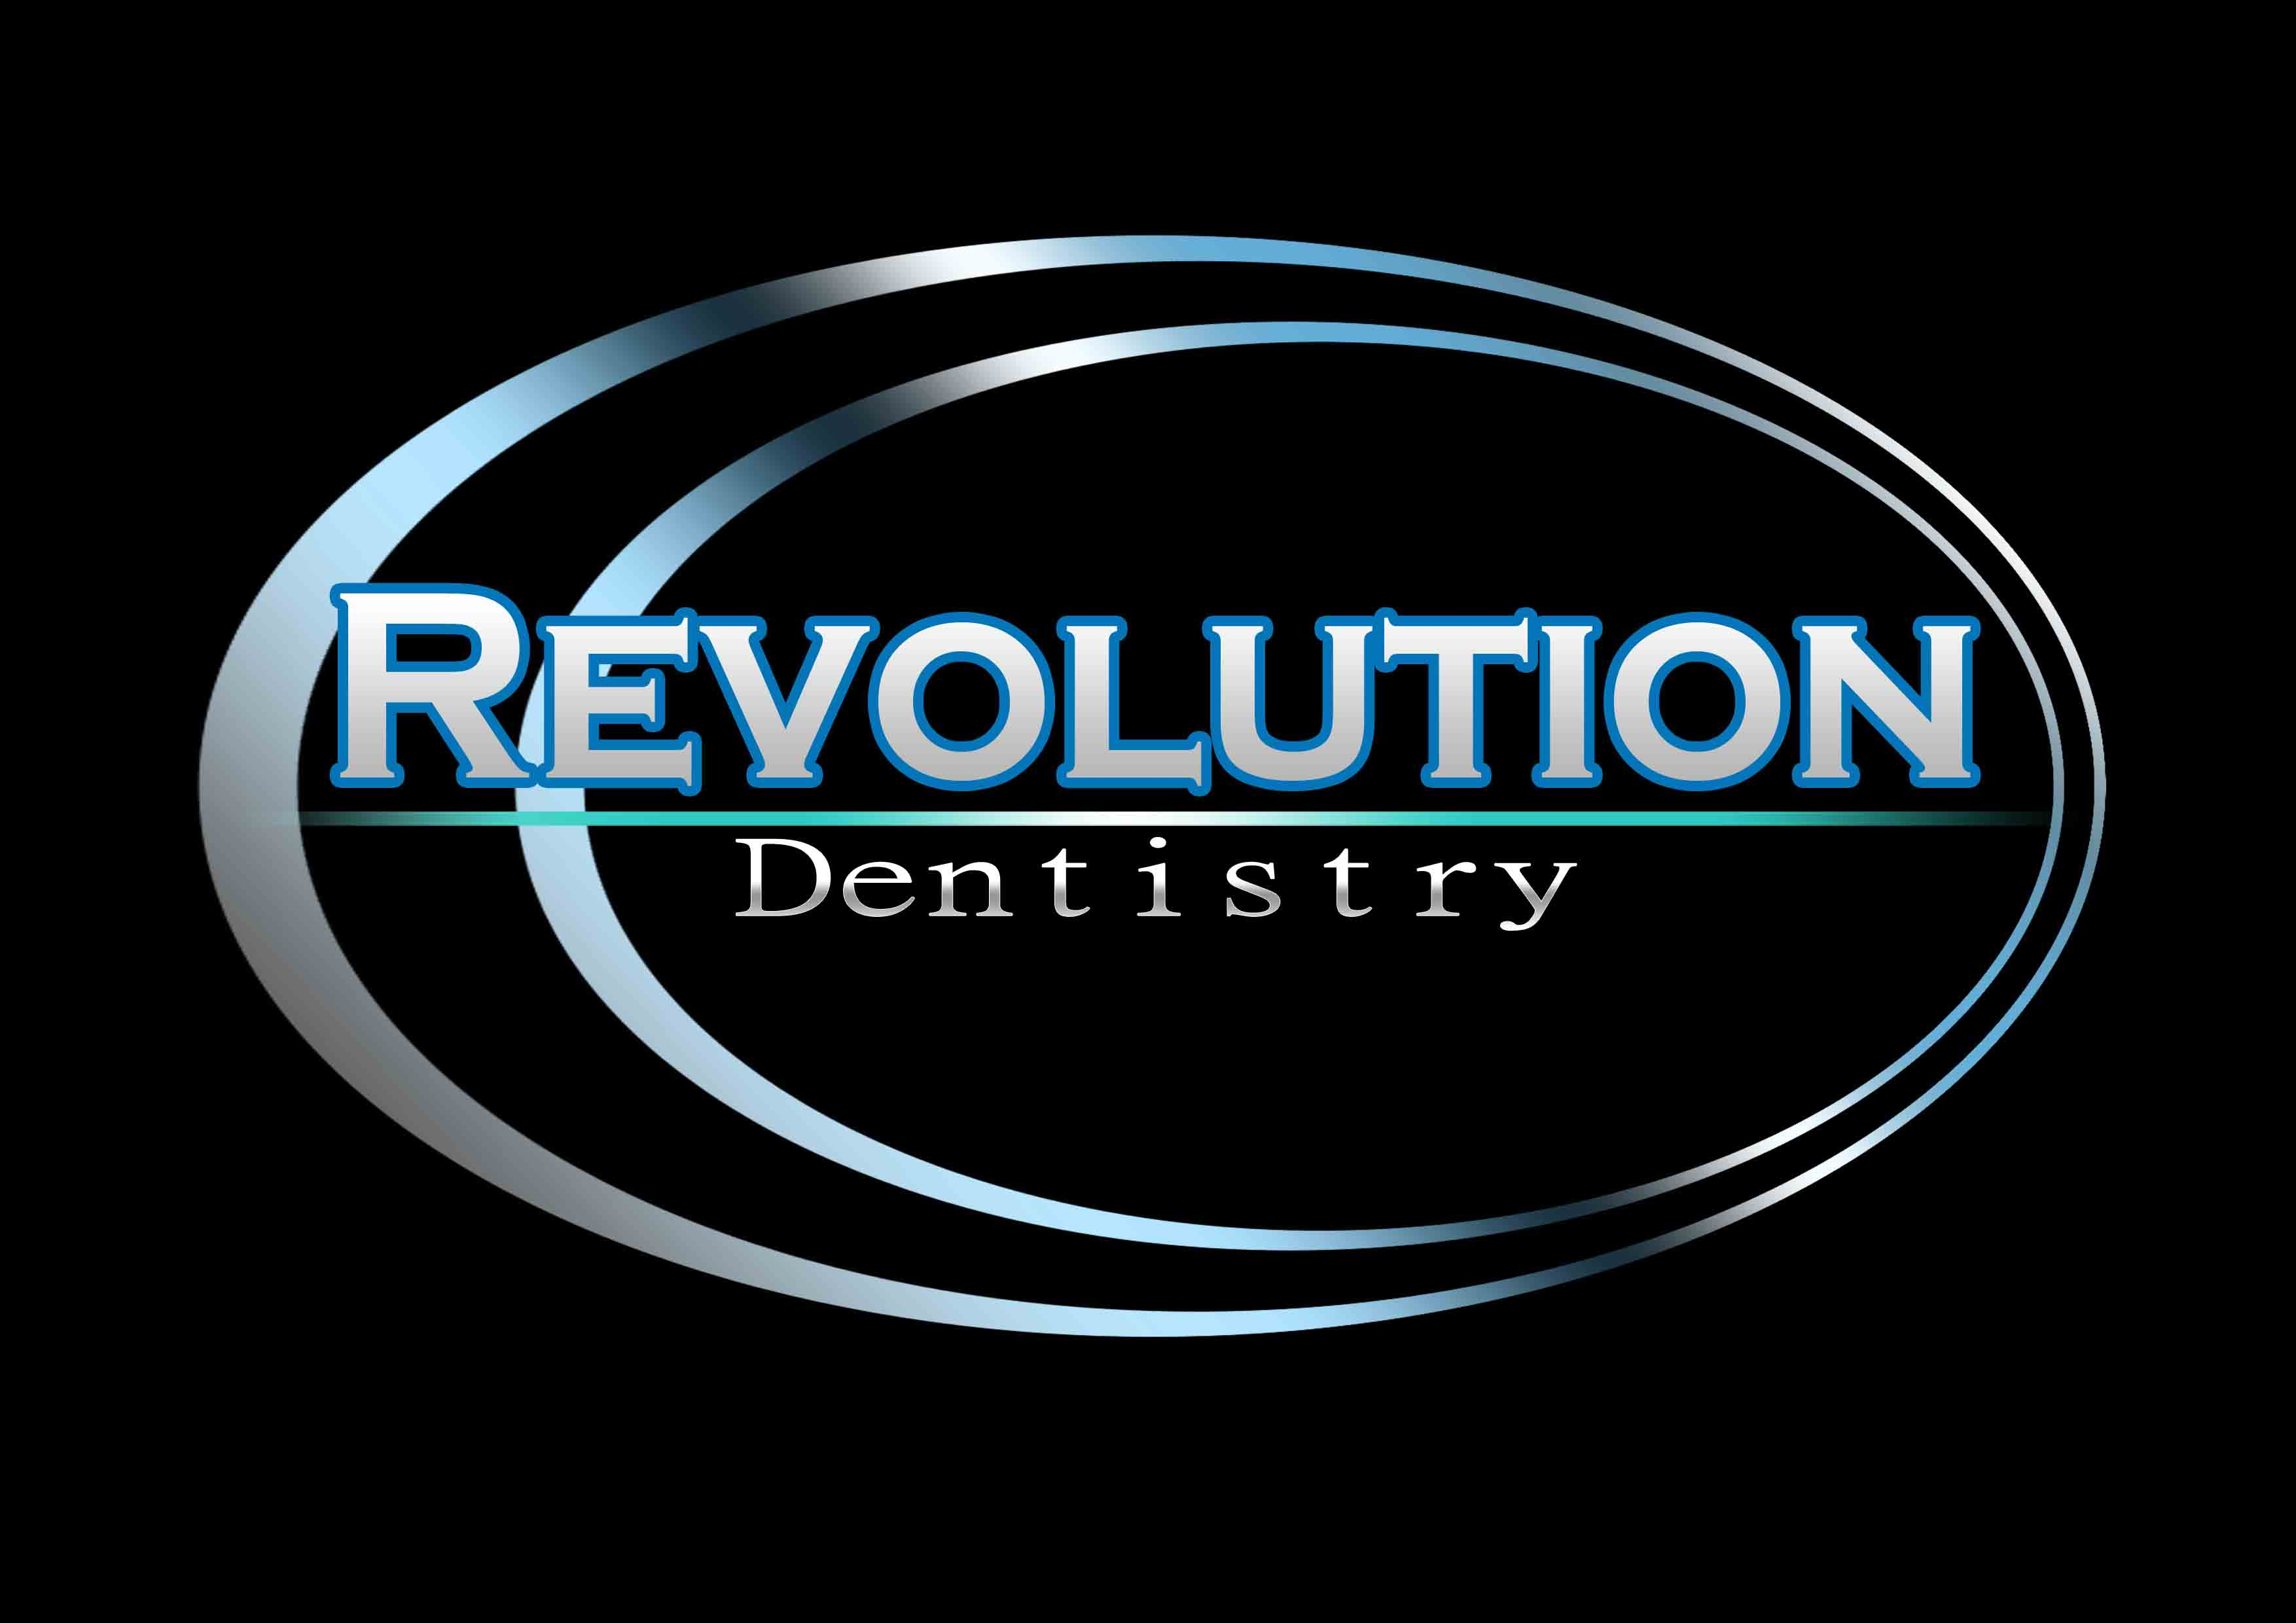 Logo Design by Jesther Jordan Minor - Entry No. 64 in the Logo Design Contest Artistic Logo Design for Revolution Dentistry.